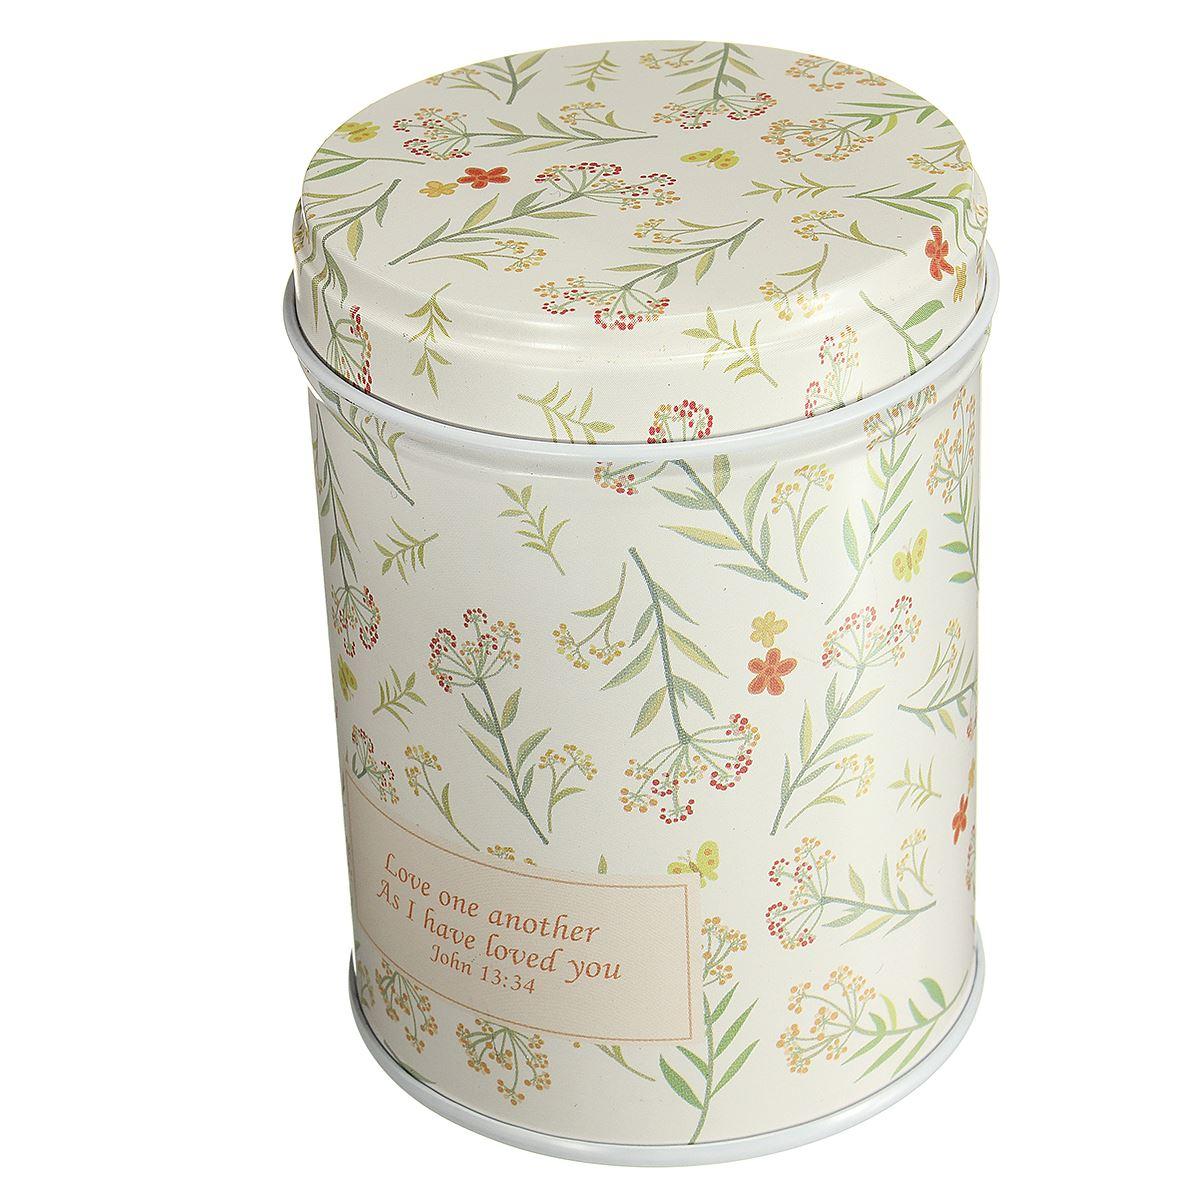 Double Cover Tea Tinplate Jar 500g Organic Tie Guan Yin Chinese Tea Leaf Organic Tie Guan Yin Green Tea Storage Box Metal(China (Mainland))